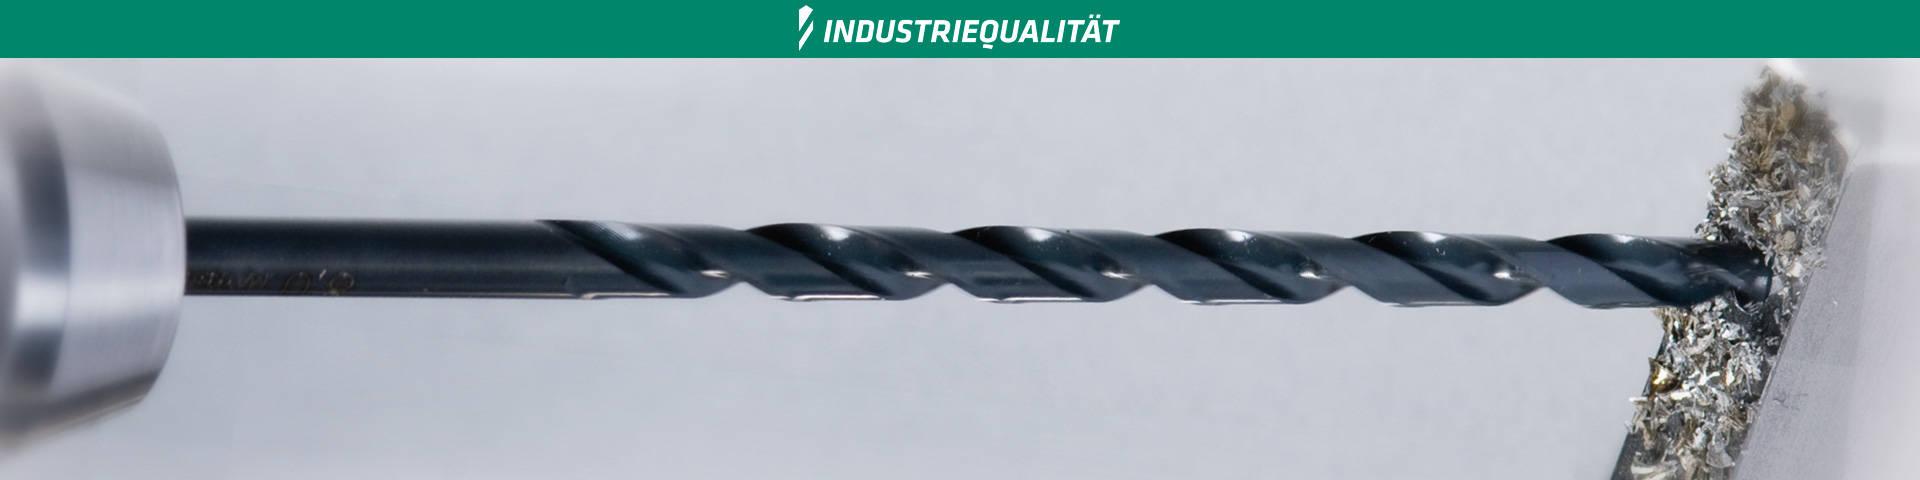 Alpen alpen-maykestag Steel HSS Twist Drill Over Long Diameter 8,0X240/mm Pack of 1